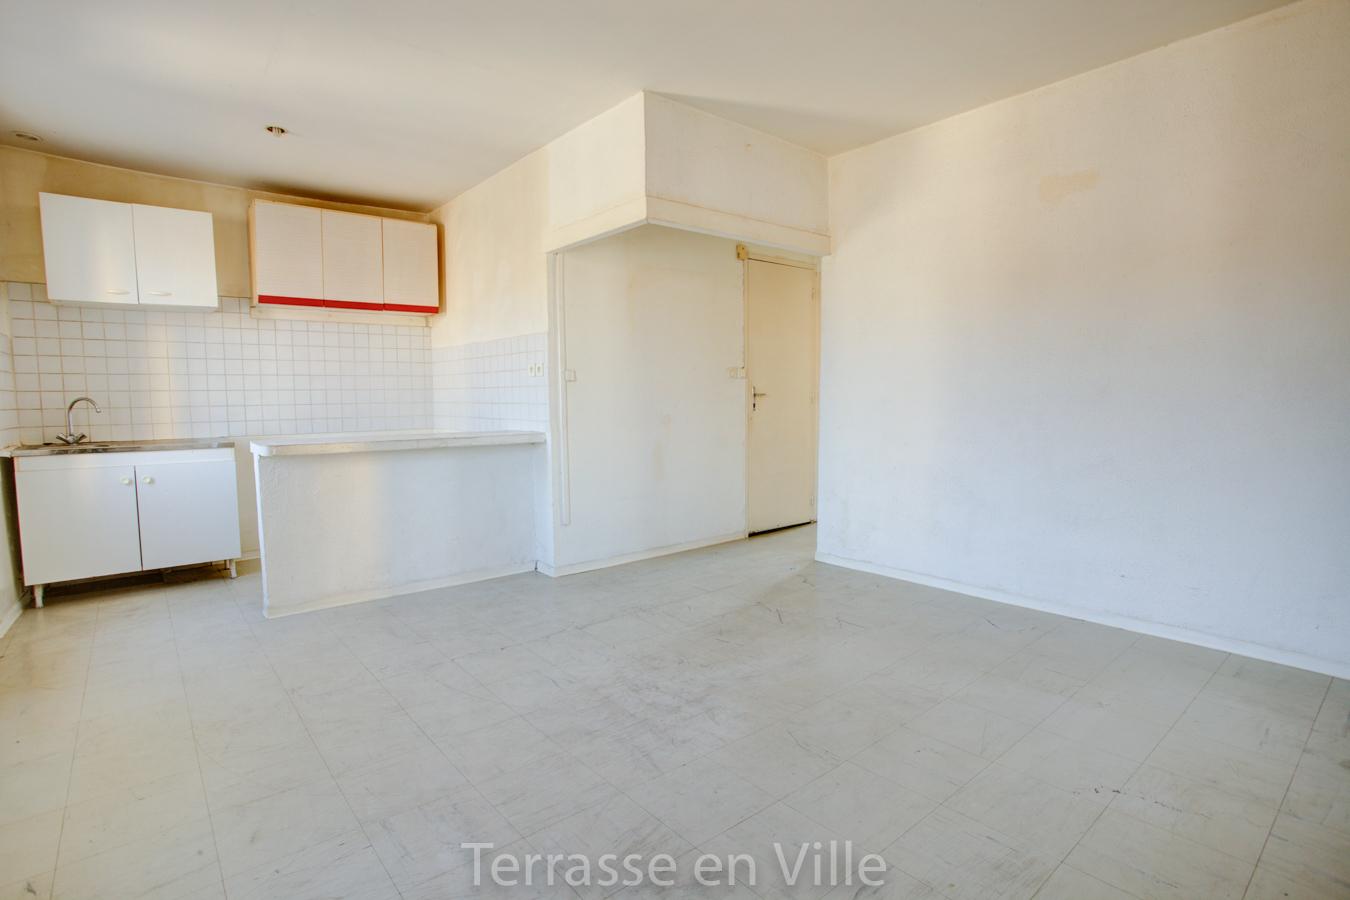 terrasse-2.jpg